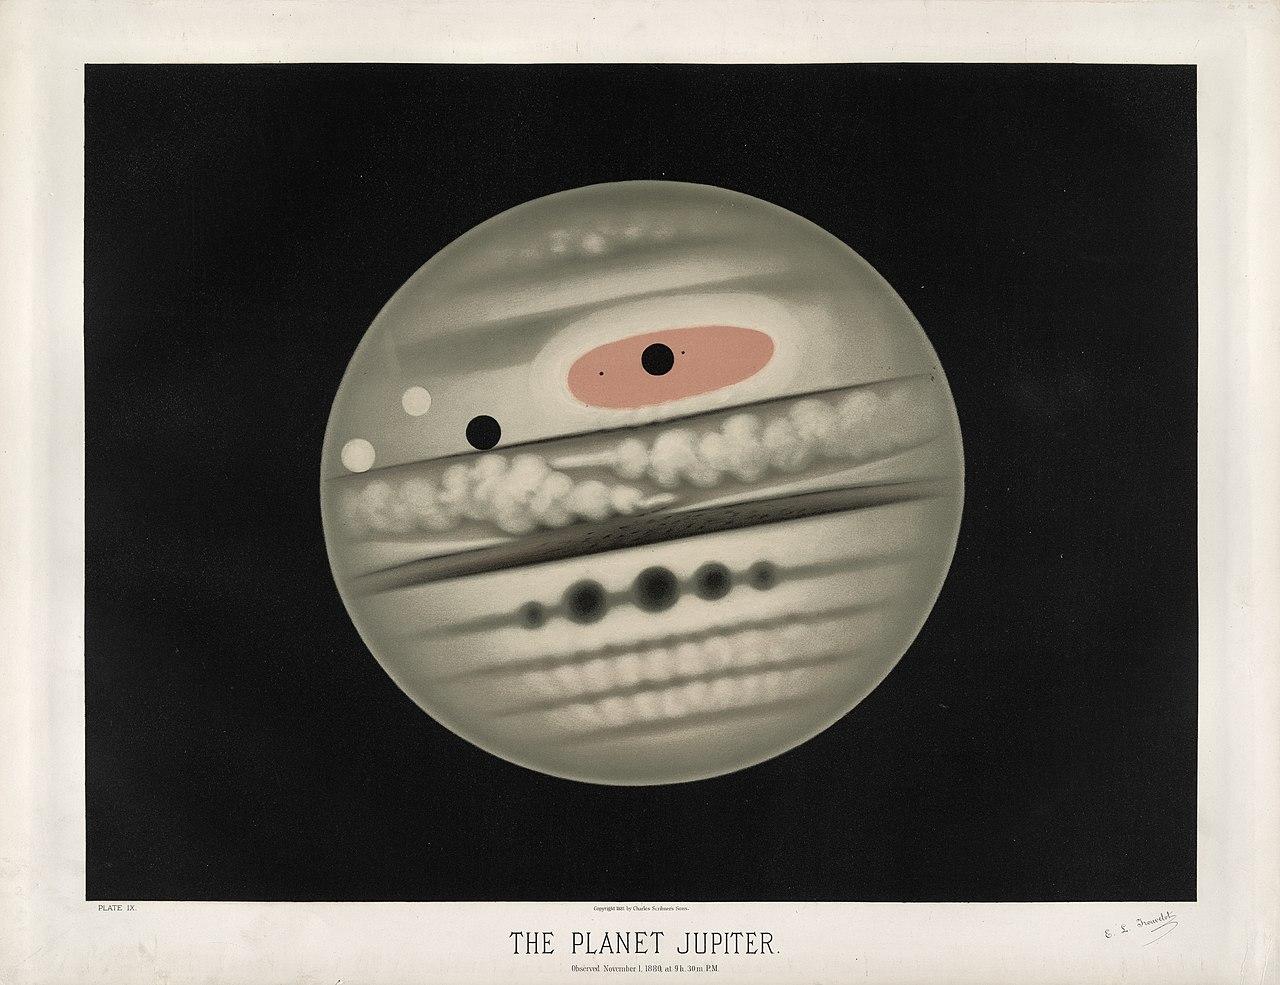 https://upload.wikimedia.org/wikipedia/commons/thumb/2/21/Trouvelot_-_Jupiter_-_1880.jpg/1280px-Trouvelot_-_Jupiter_-_1880.jpg